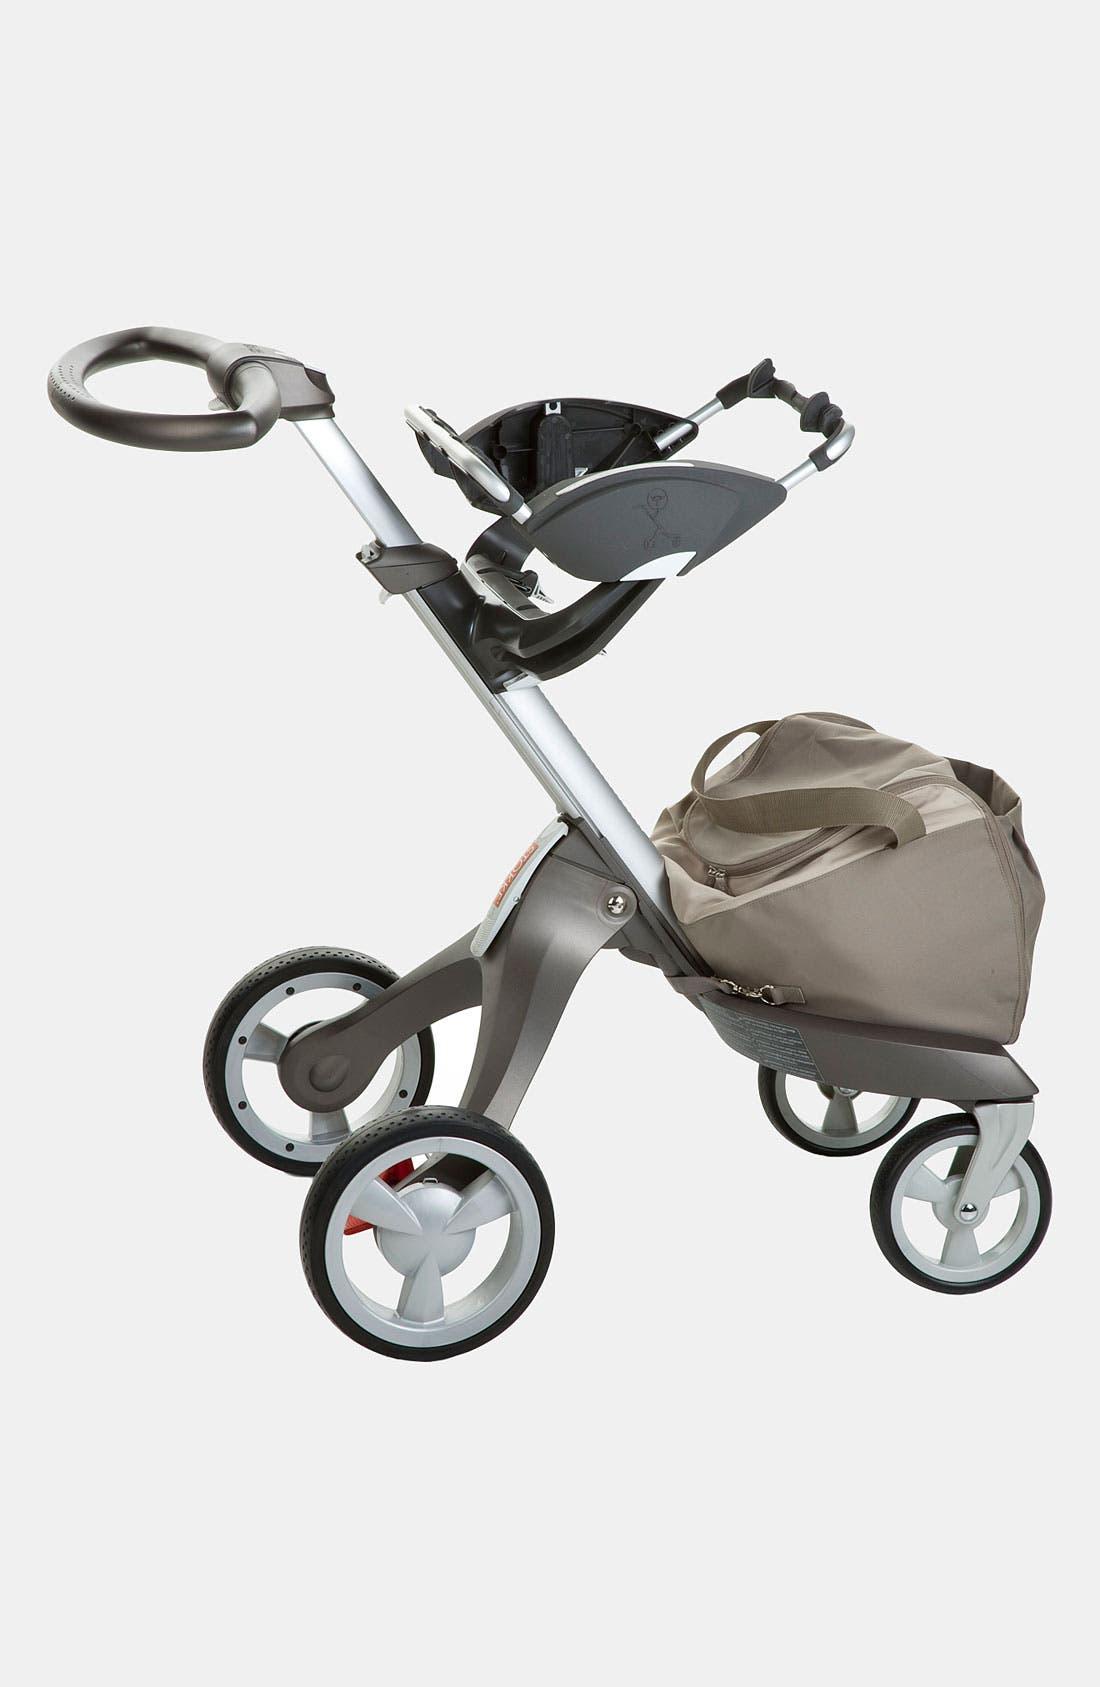 Main Image - Stokke Xplory® Stroller to Graco® Car Seat Adaptor